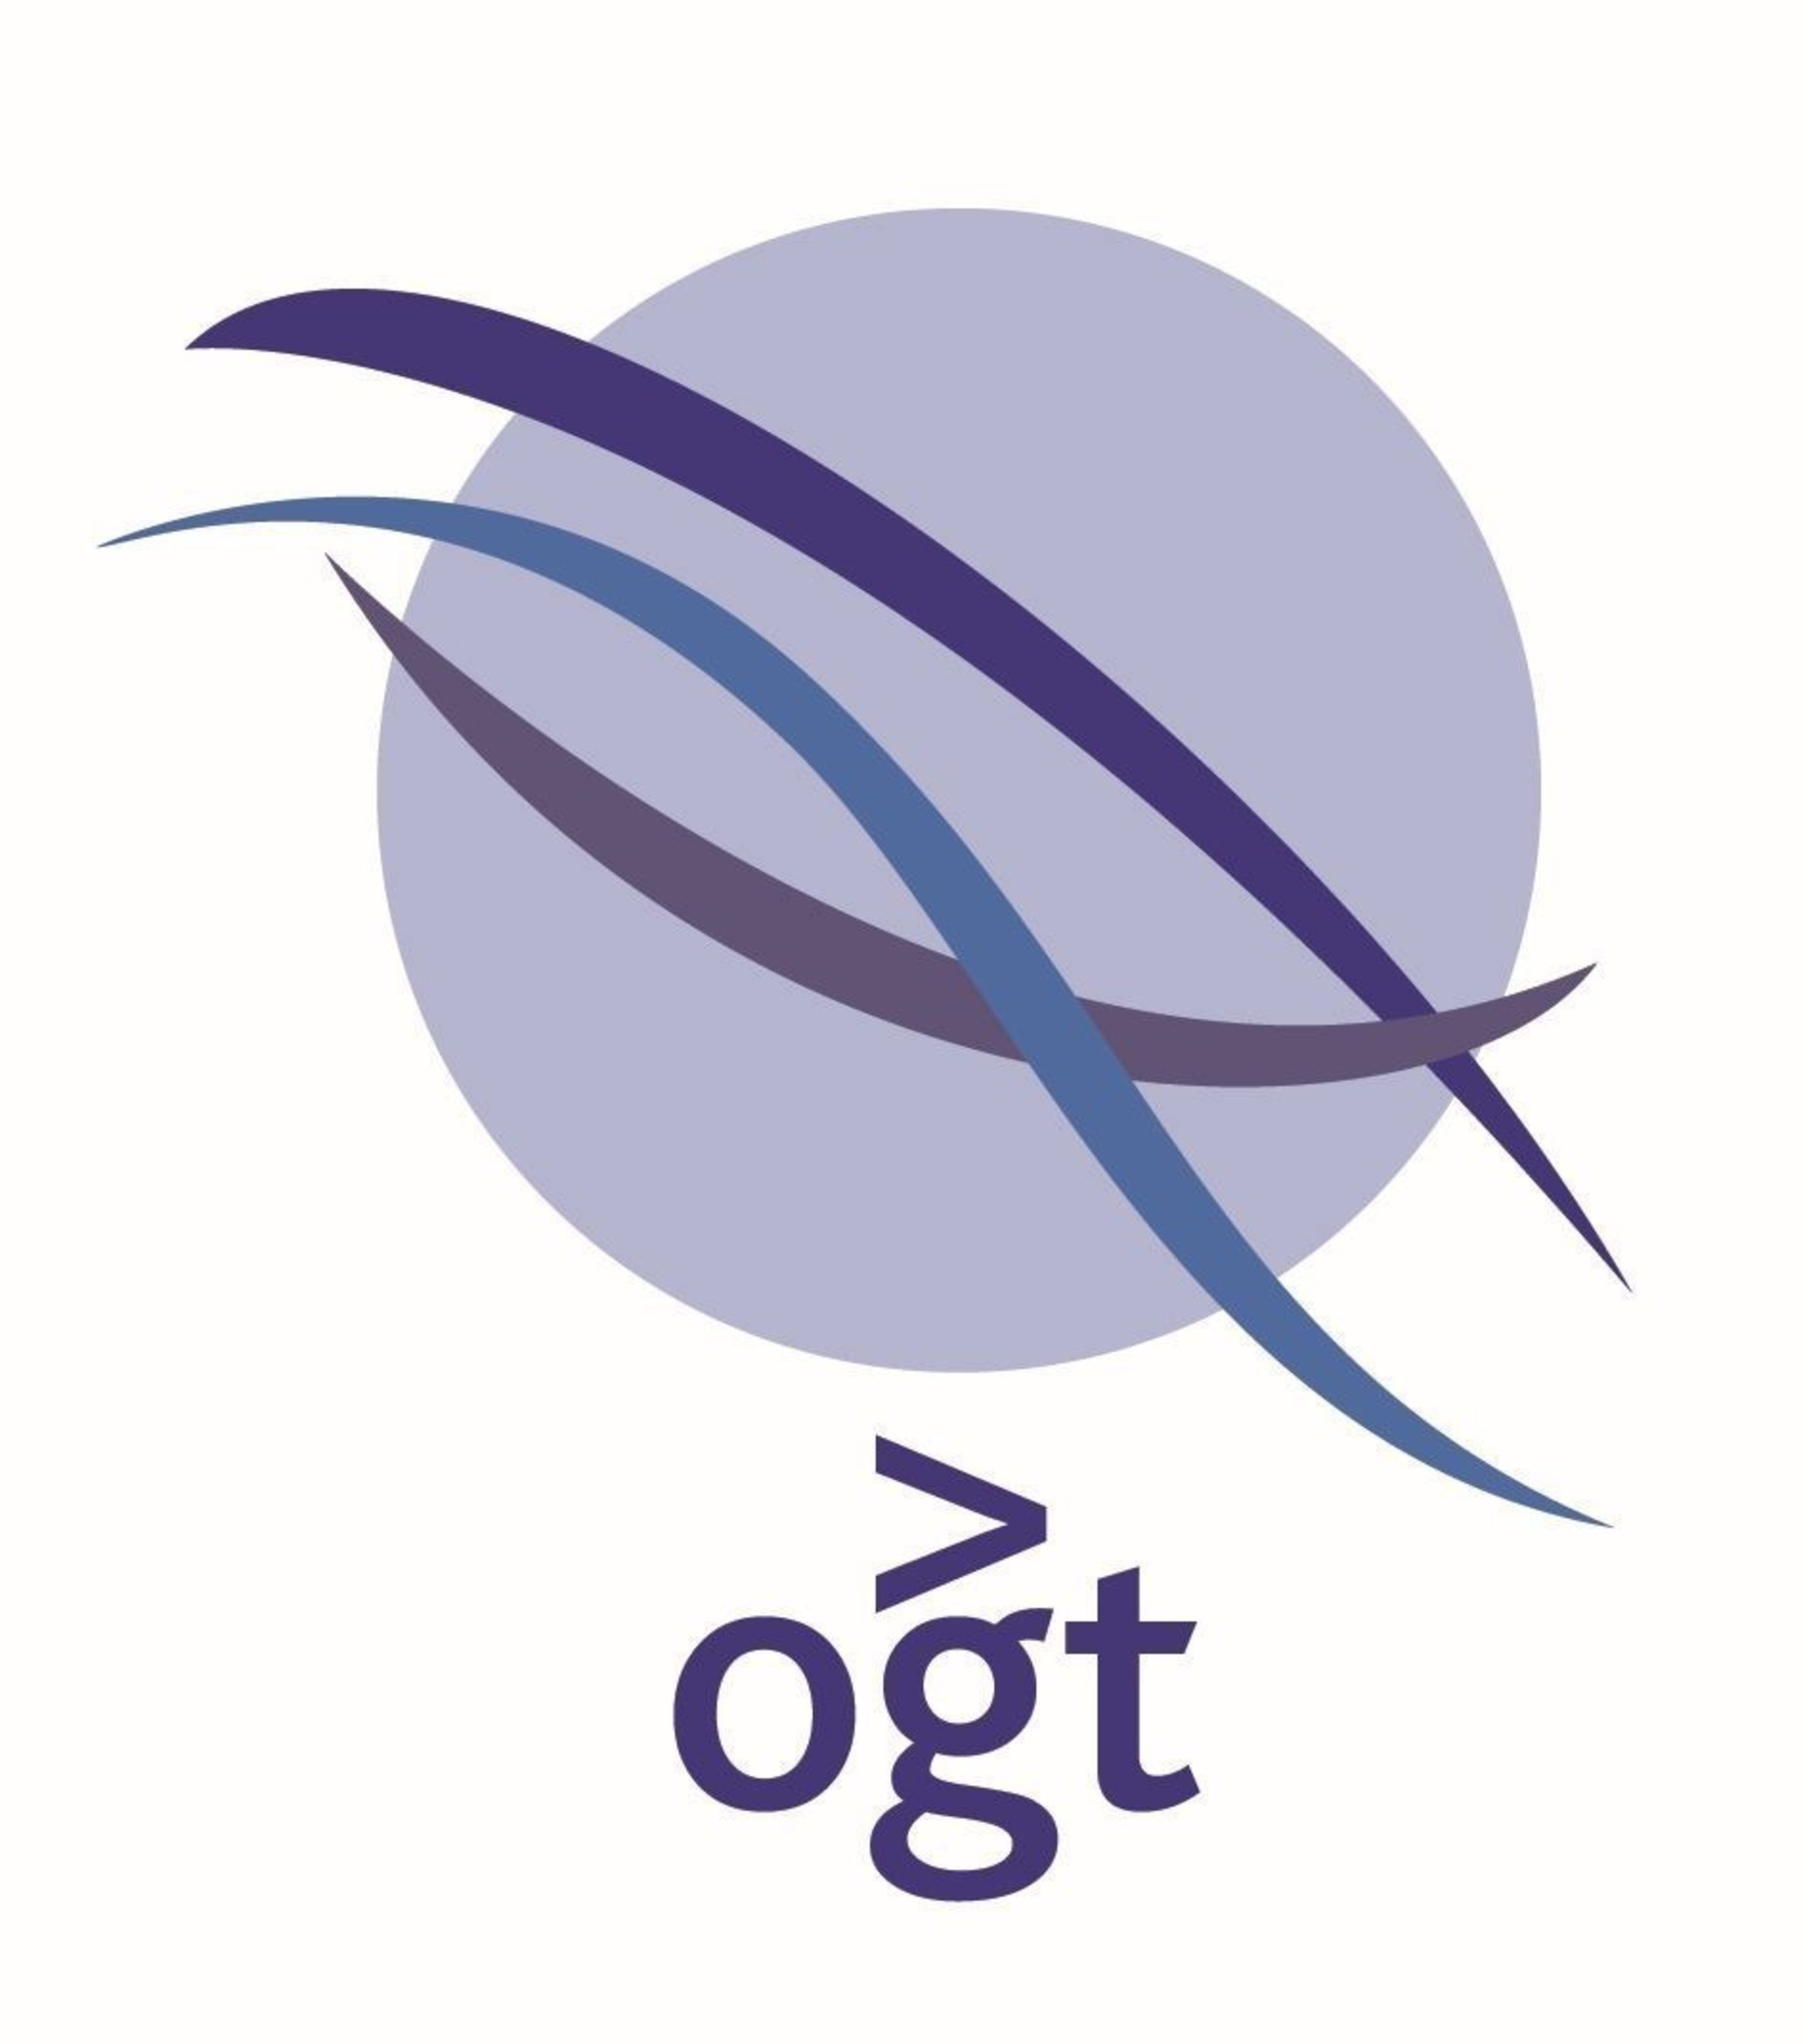 Oxford Gene Technology (PRNewsFoto/Oxford Gene Technology)